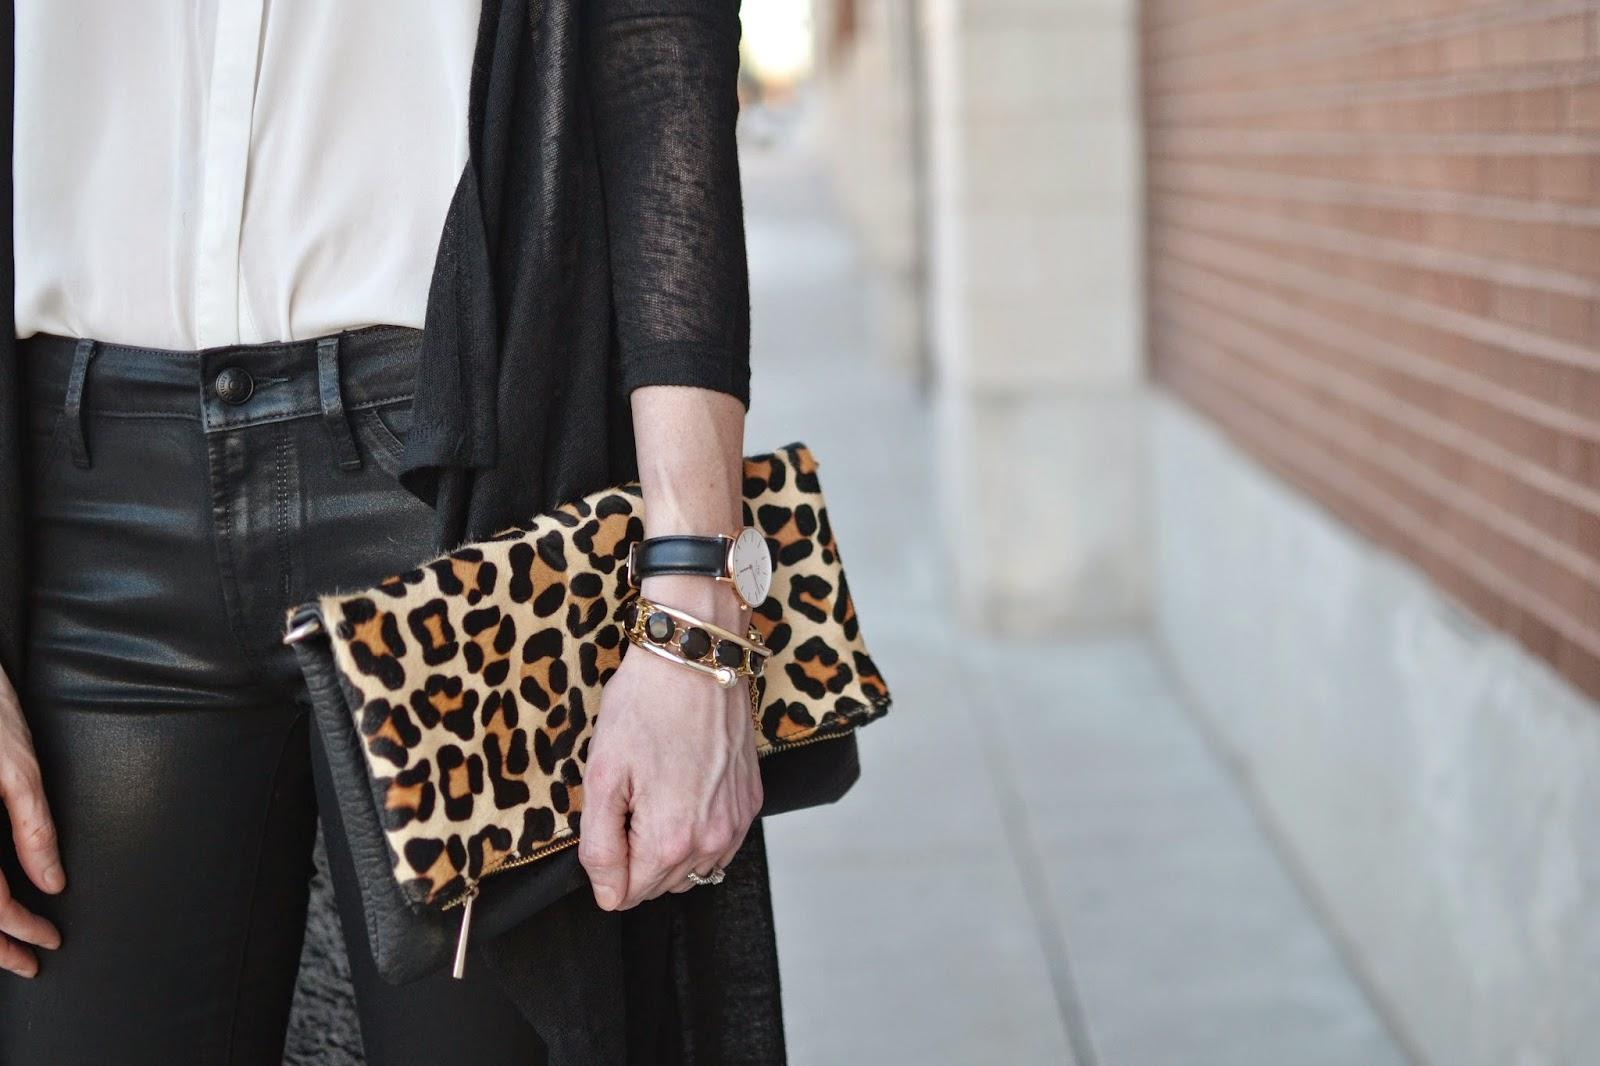 black coated skinny jeans, white blouse, black duster cardigan, leopard clutch